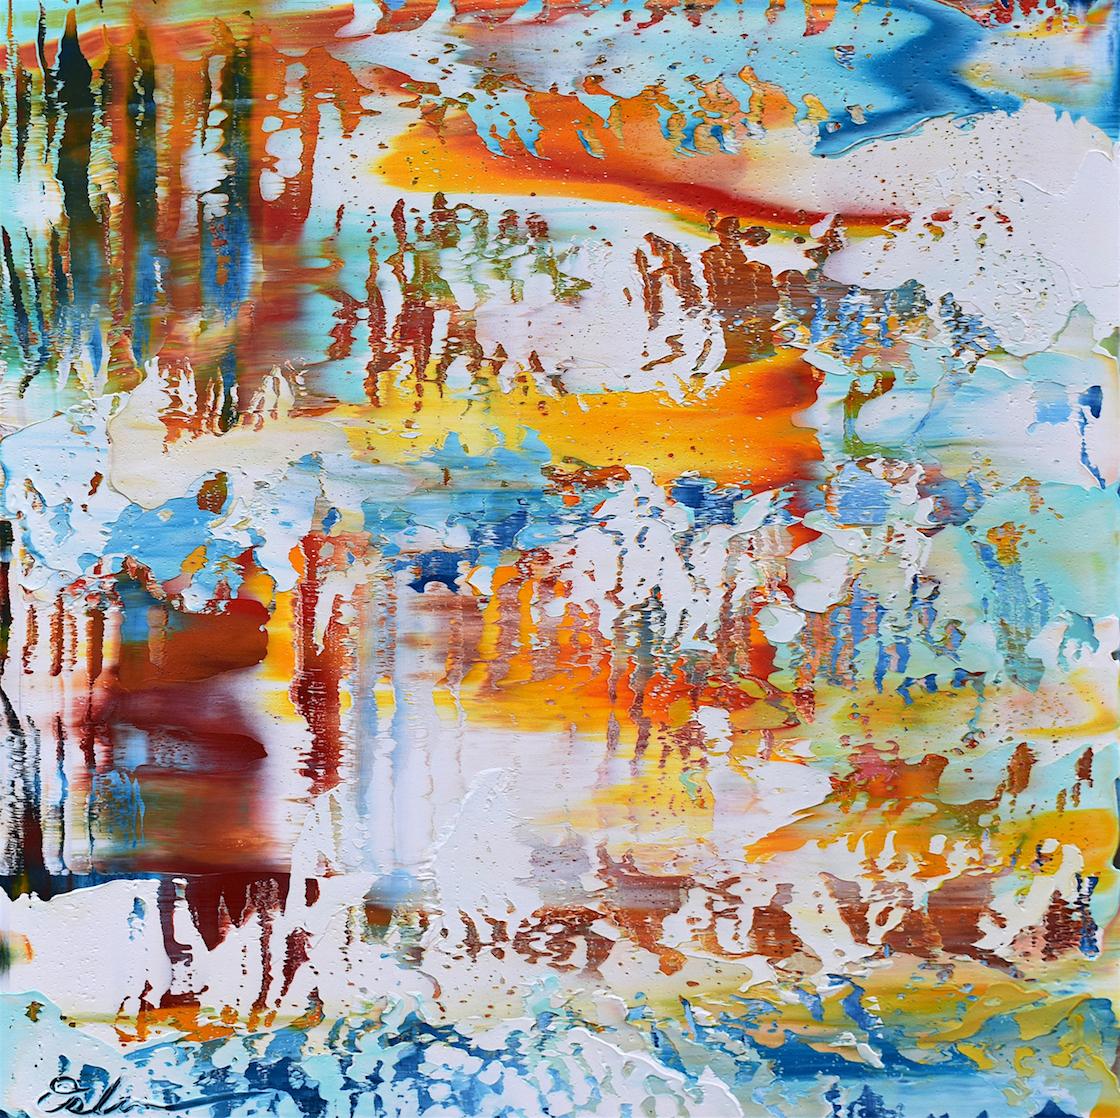 "Manipulations #2   acrylic on canvas  24"" x 24""  2017"